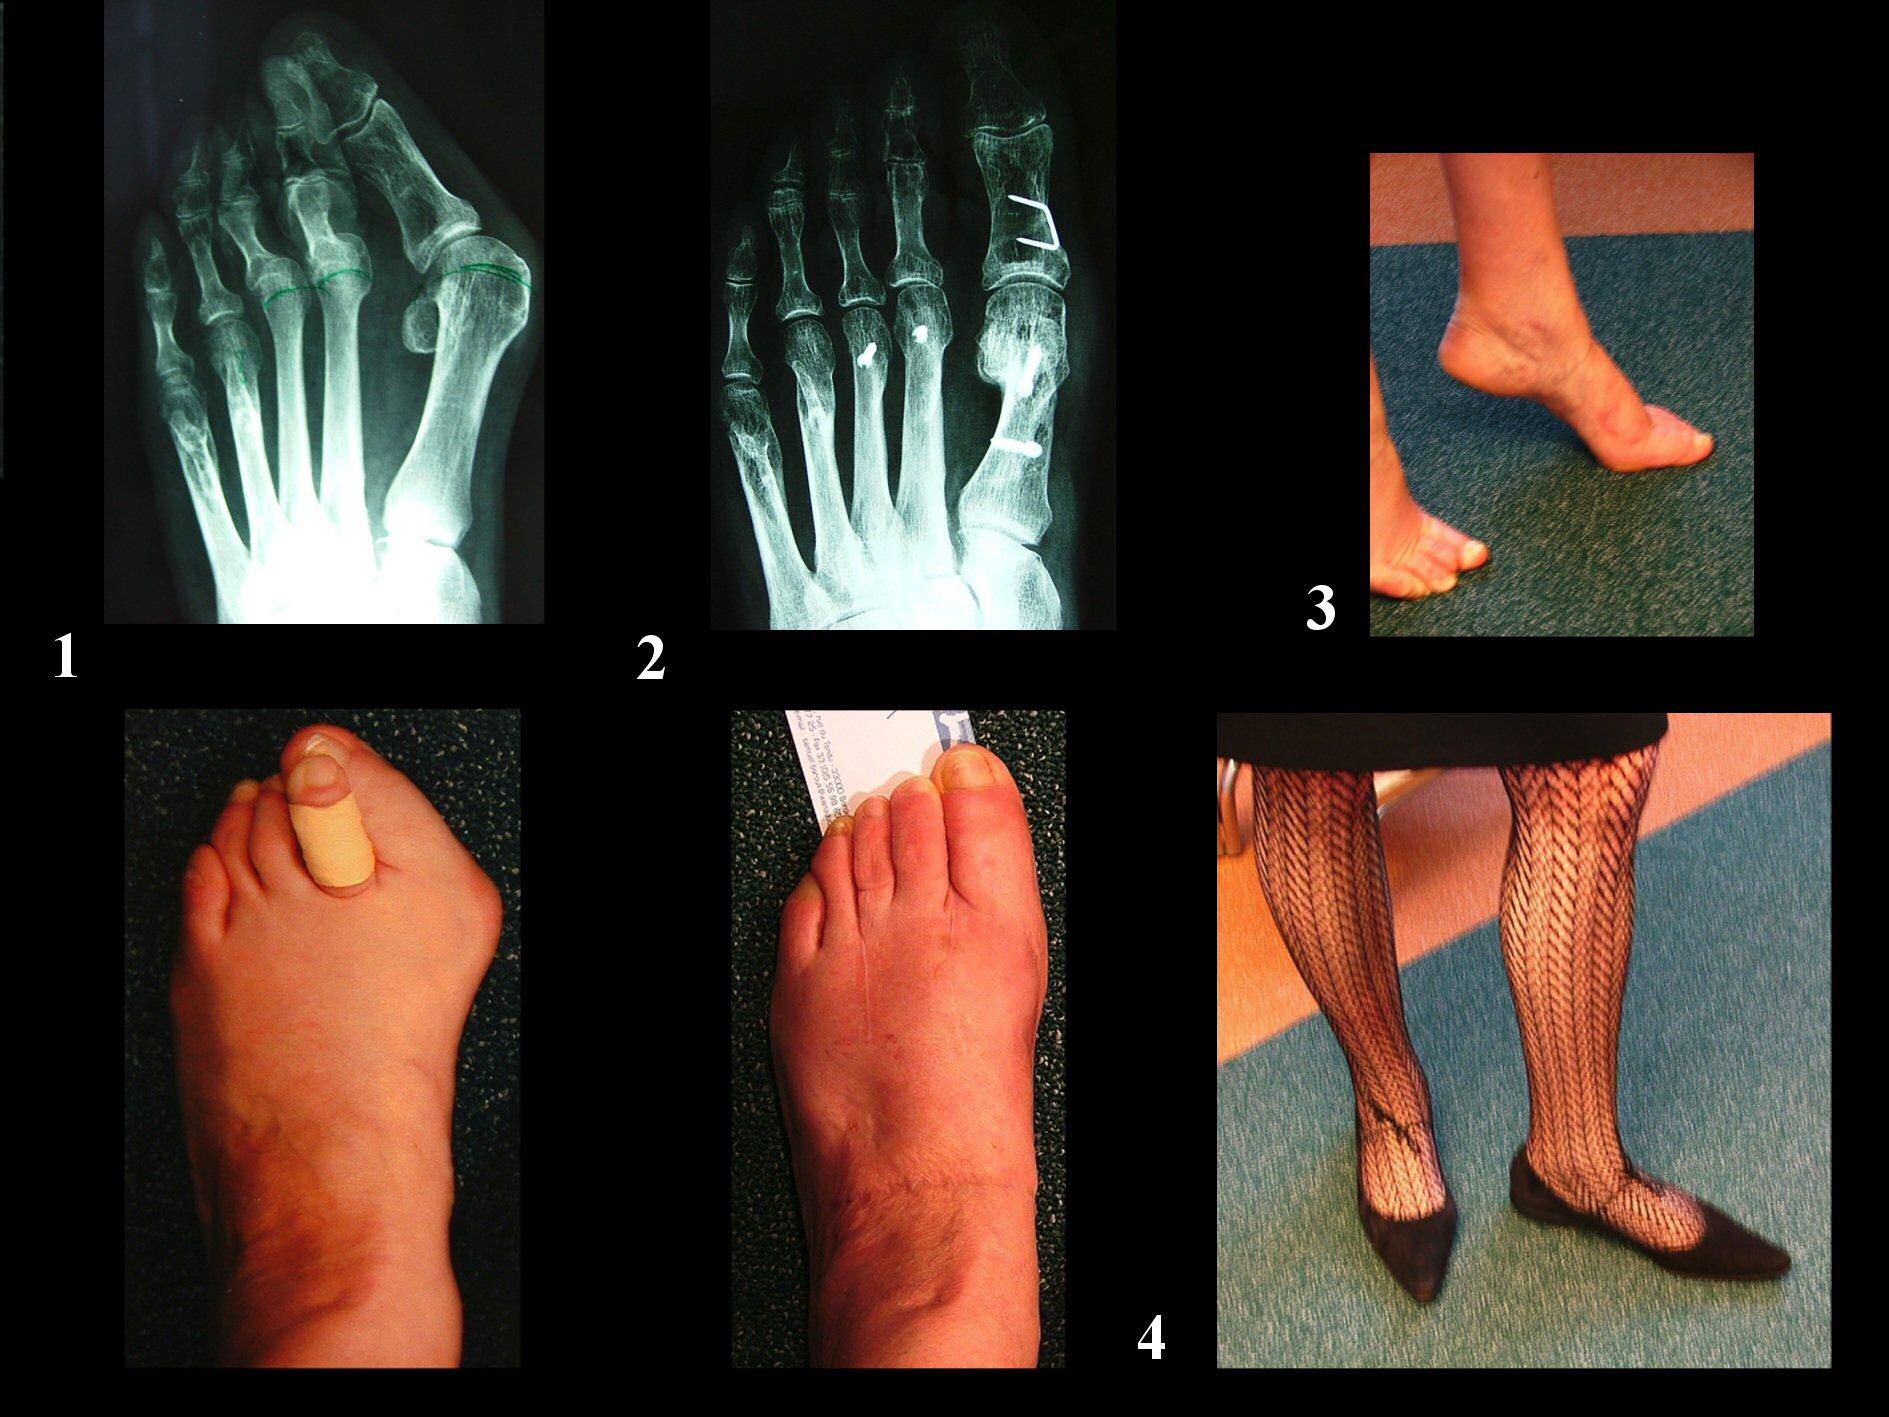 chirurgie des pieds prix